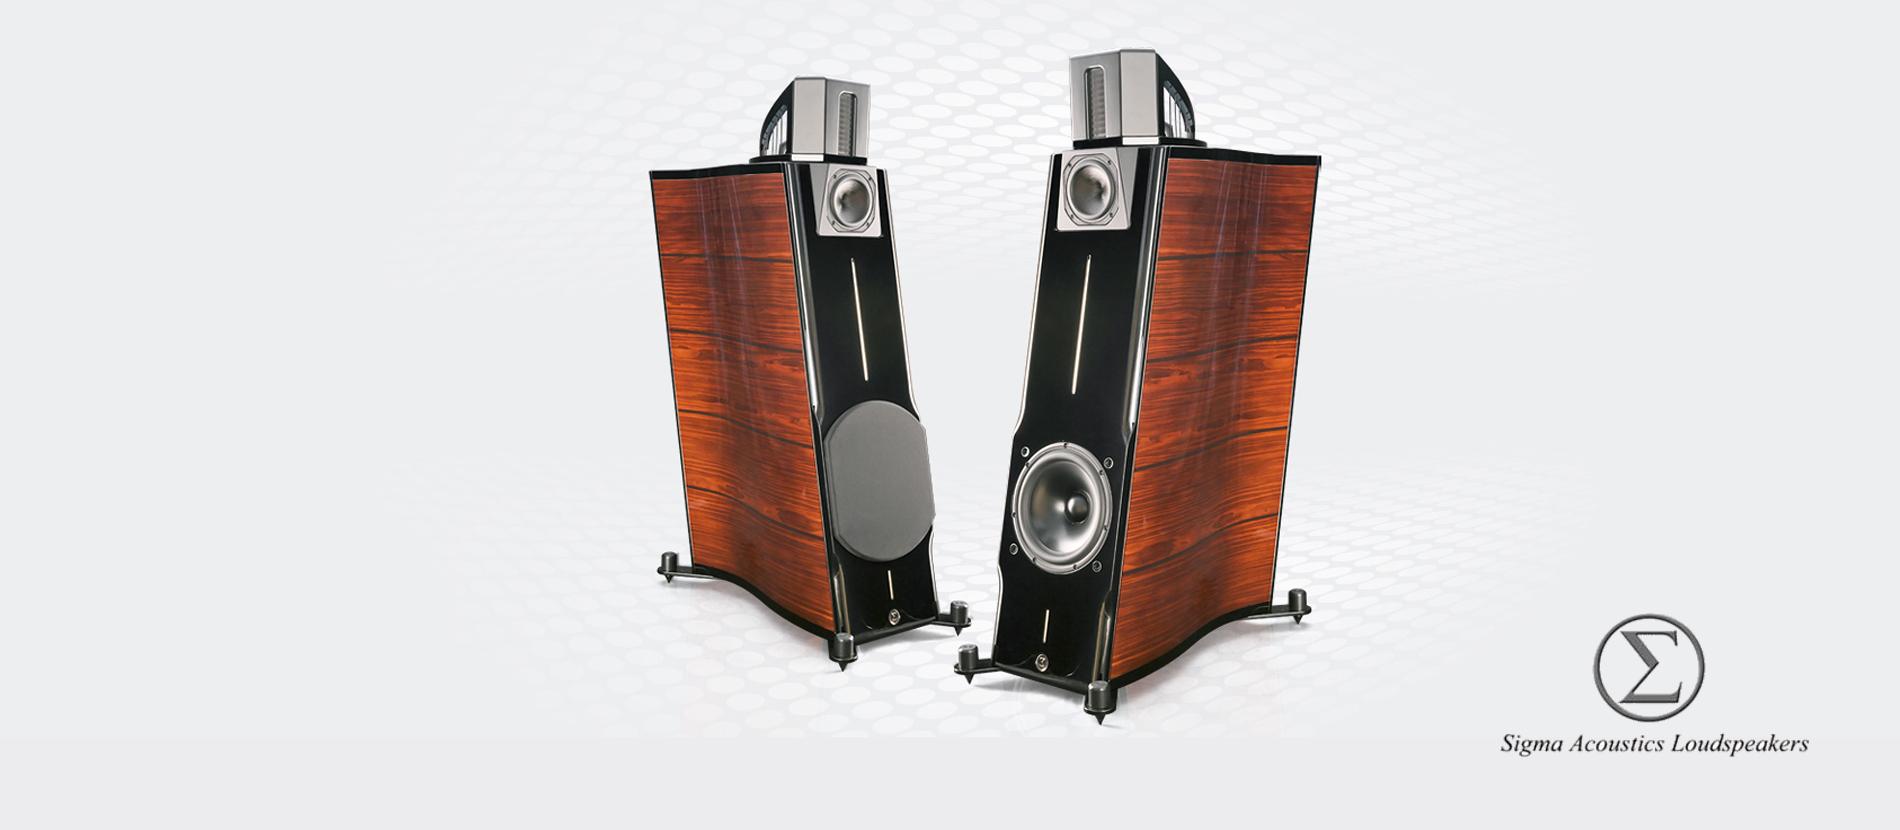 Sigma Acoustics Orchestra 2.5 loudspeakers